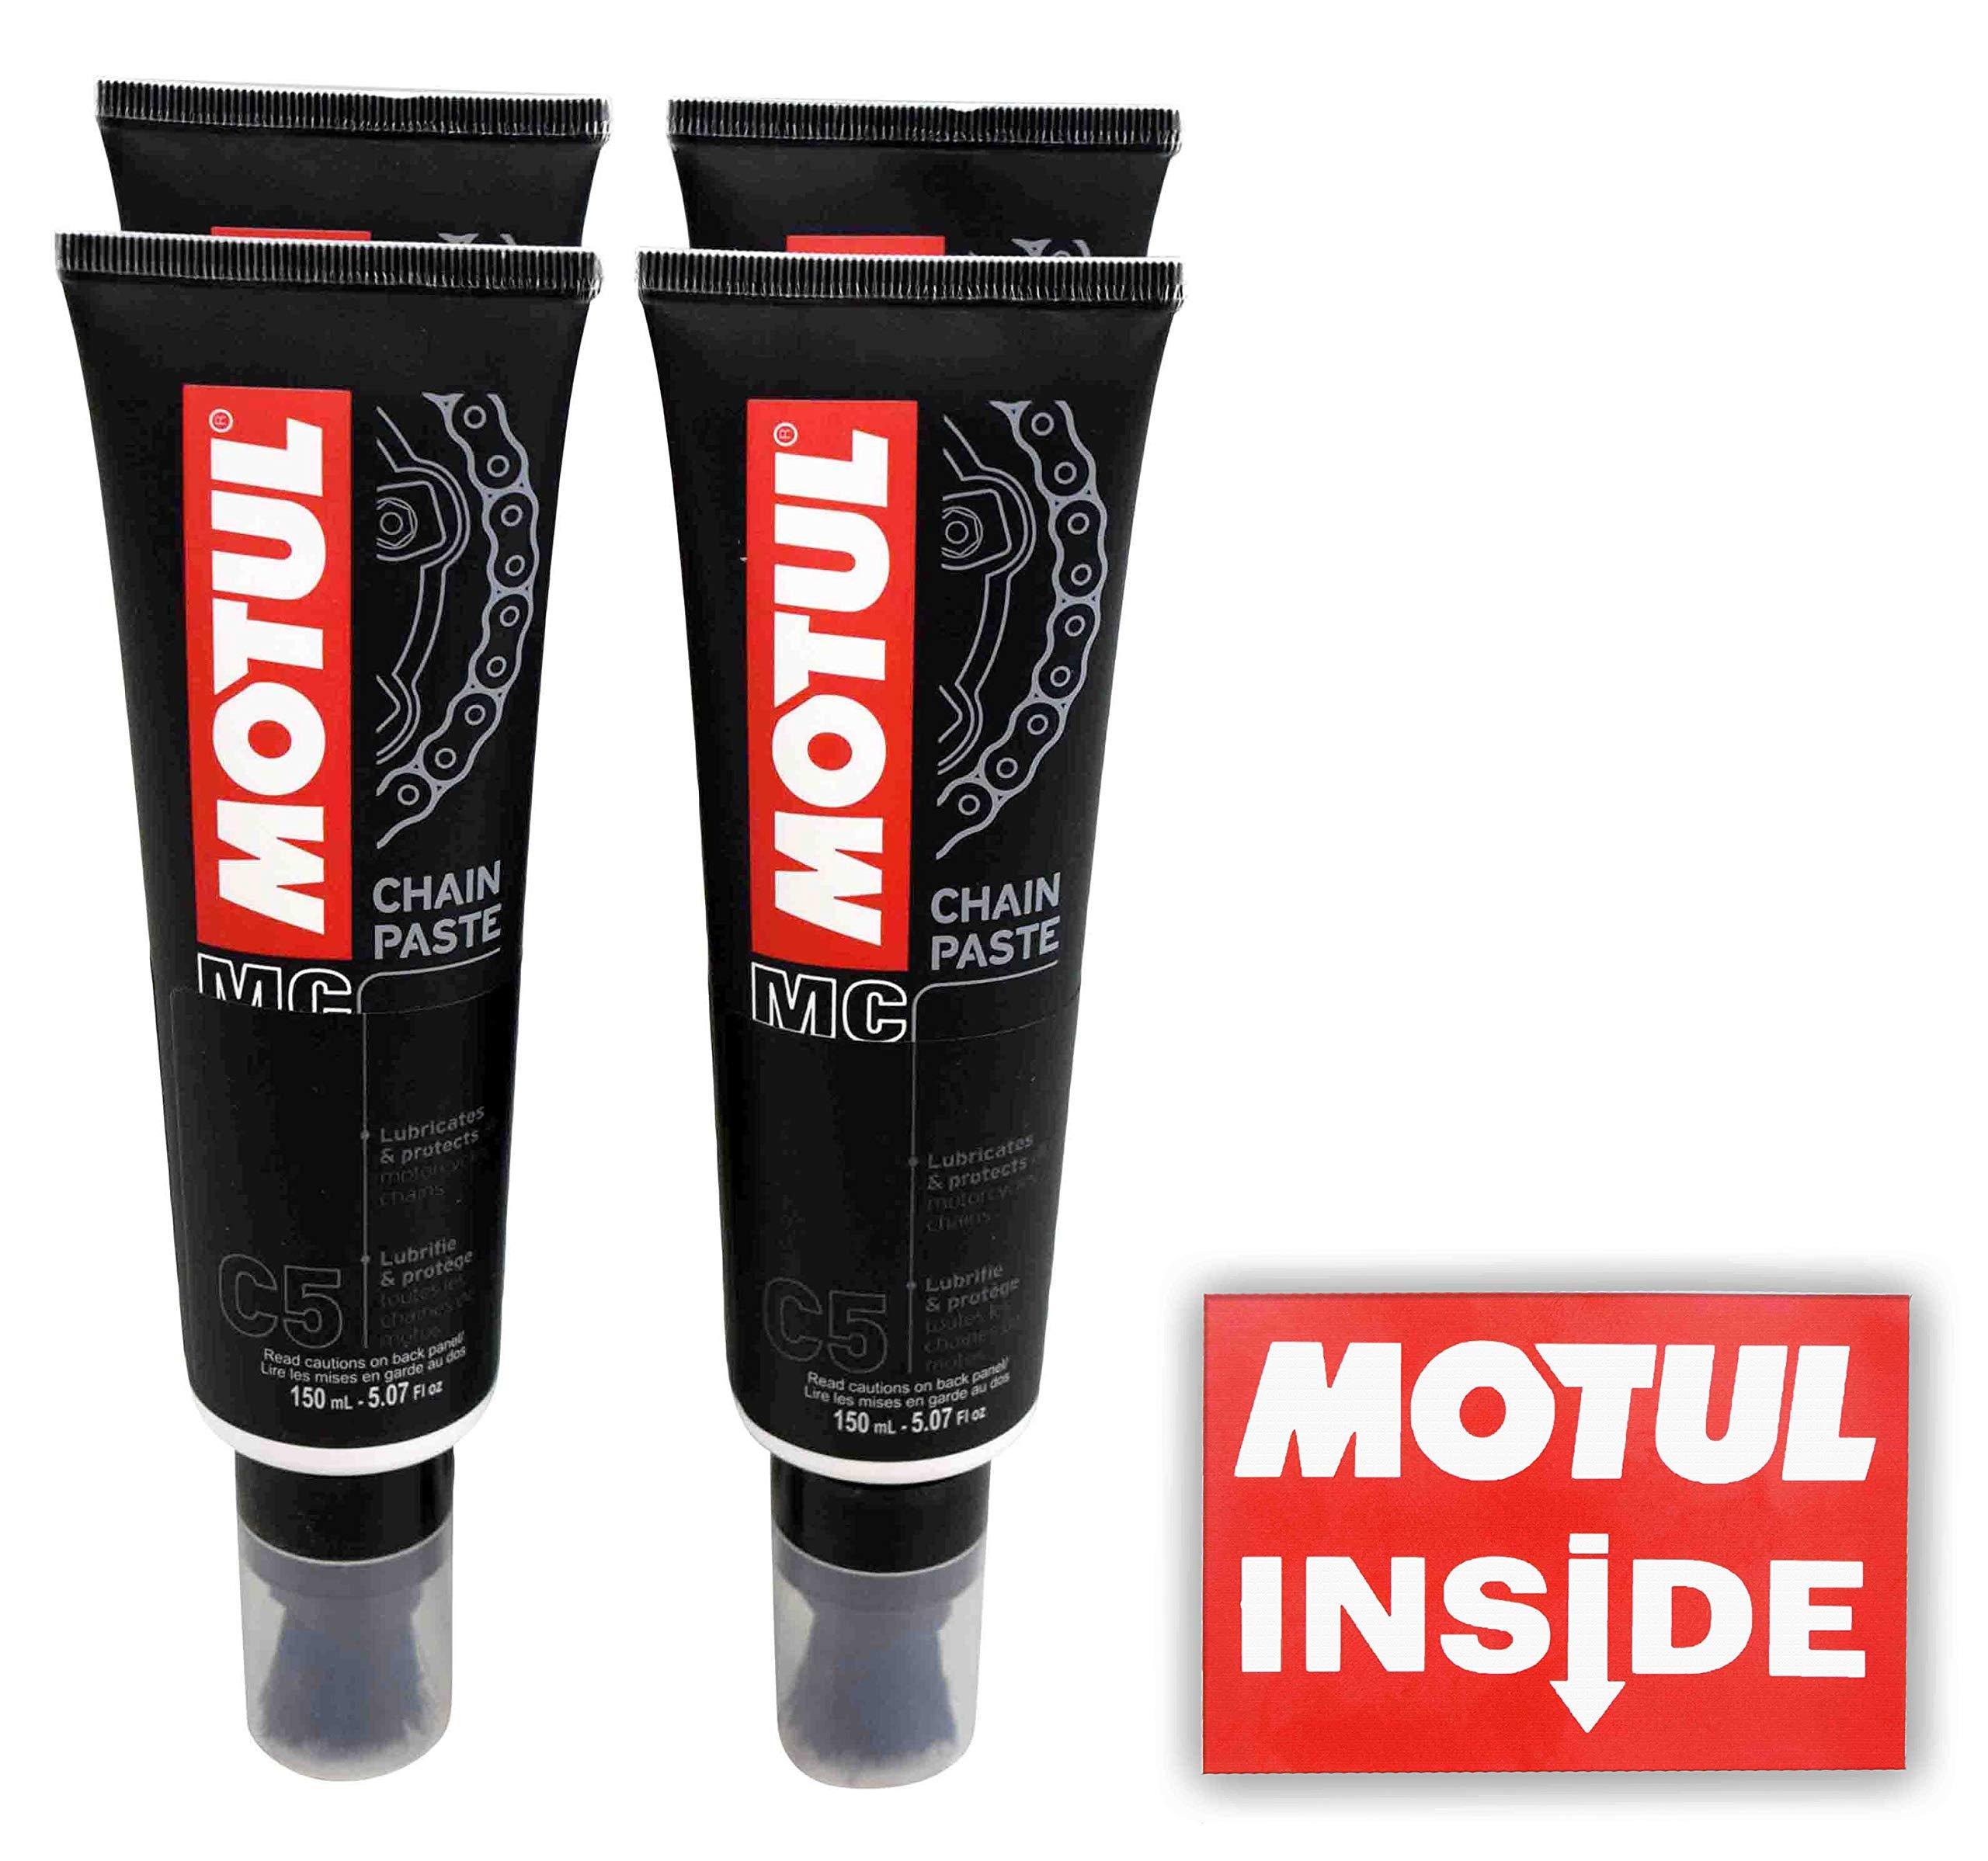 Motul 106513 C5 Chain Paste 4 Pack with No-Mess Applicator Brush Chain Lubricant 150mL Bottle with Premium Motul Sticker (4) by Motul Powersports